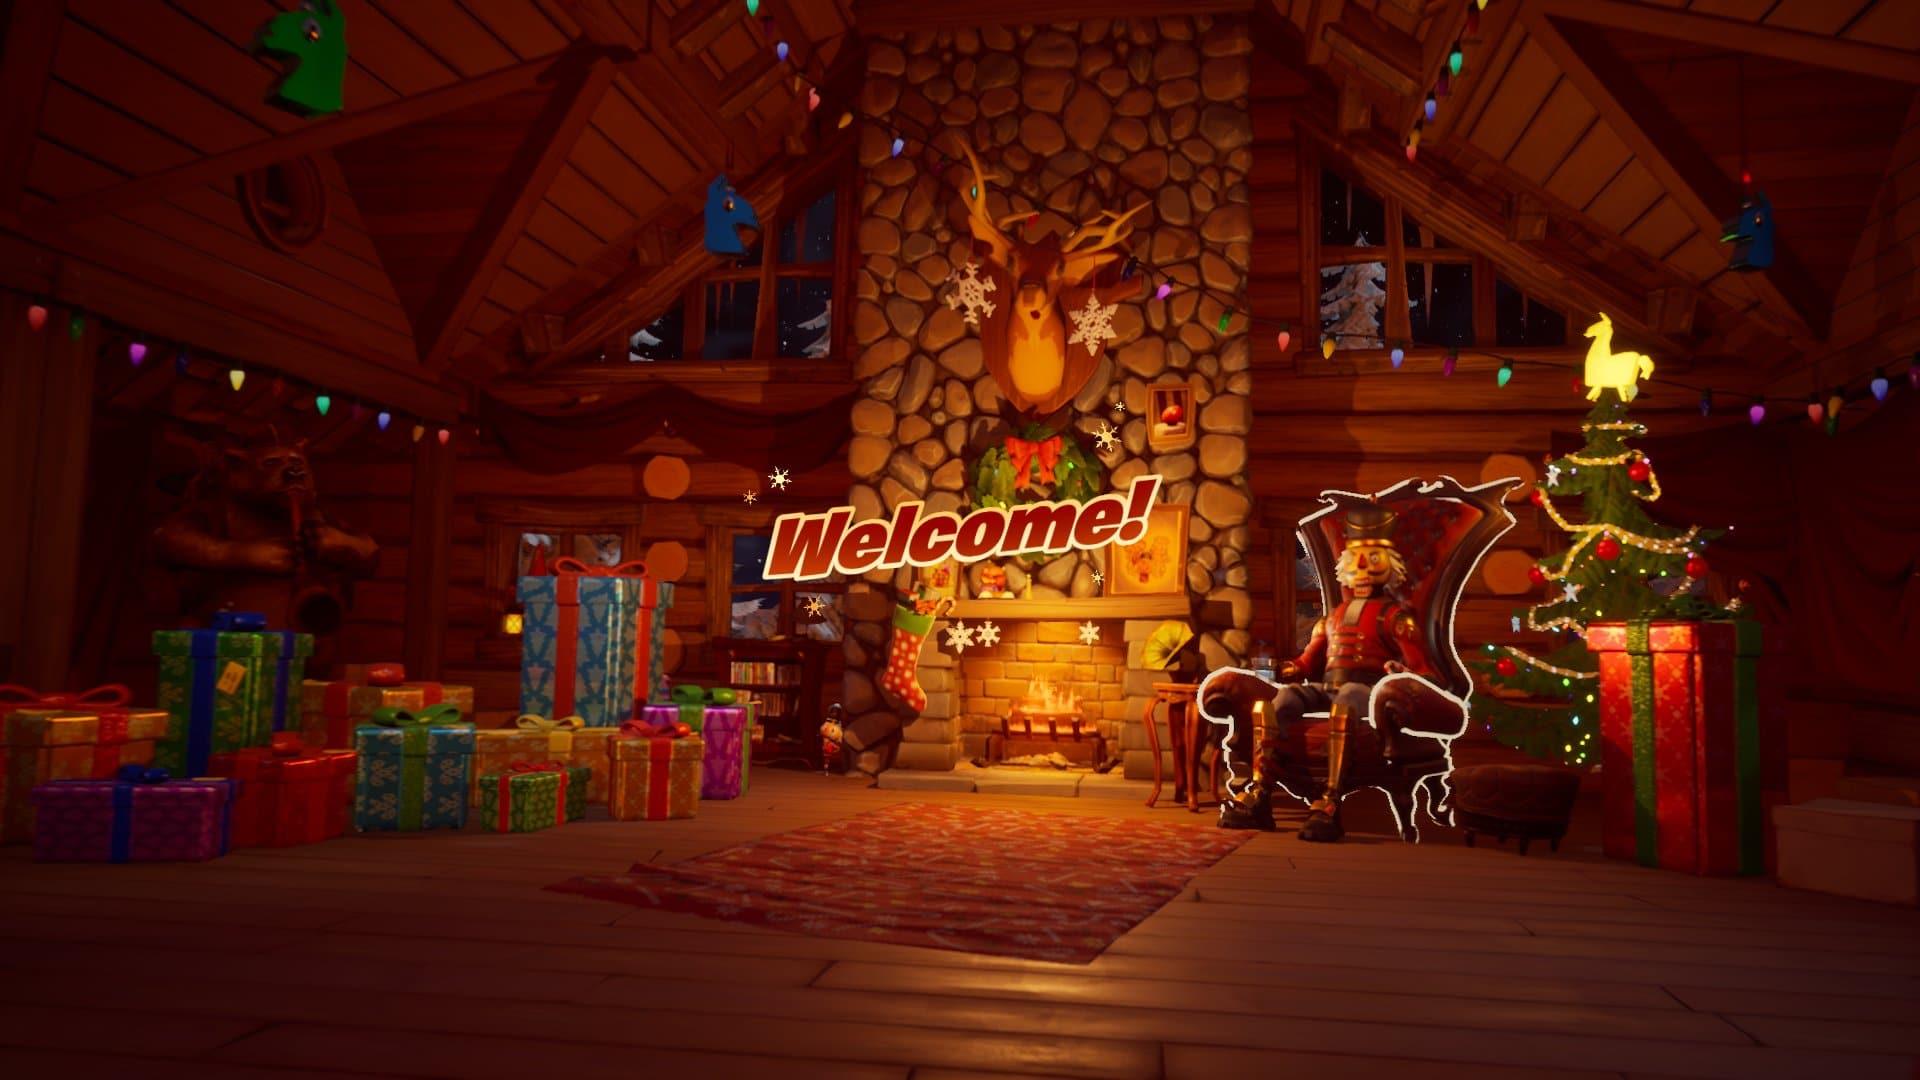 Fortnite Winterfest Lobby Screen Daily Rewards Leaked